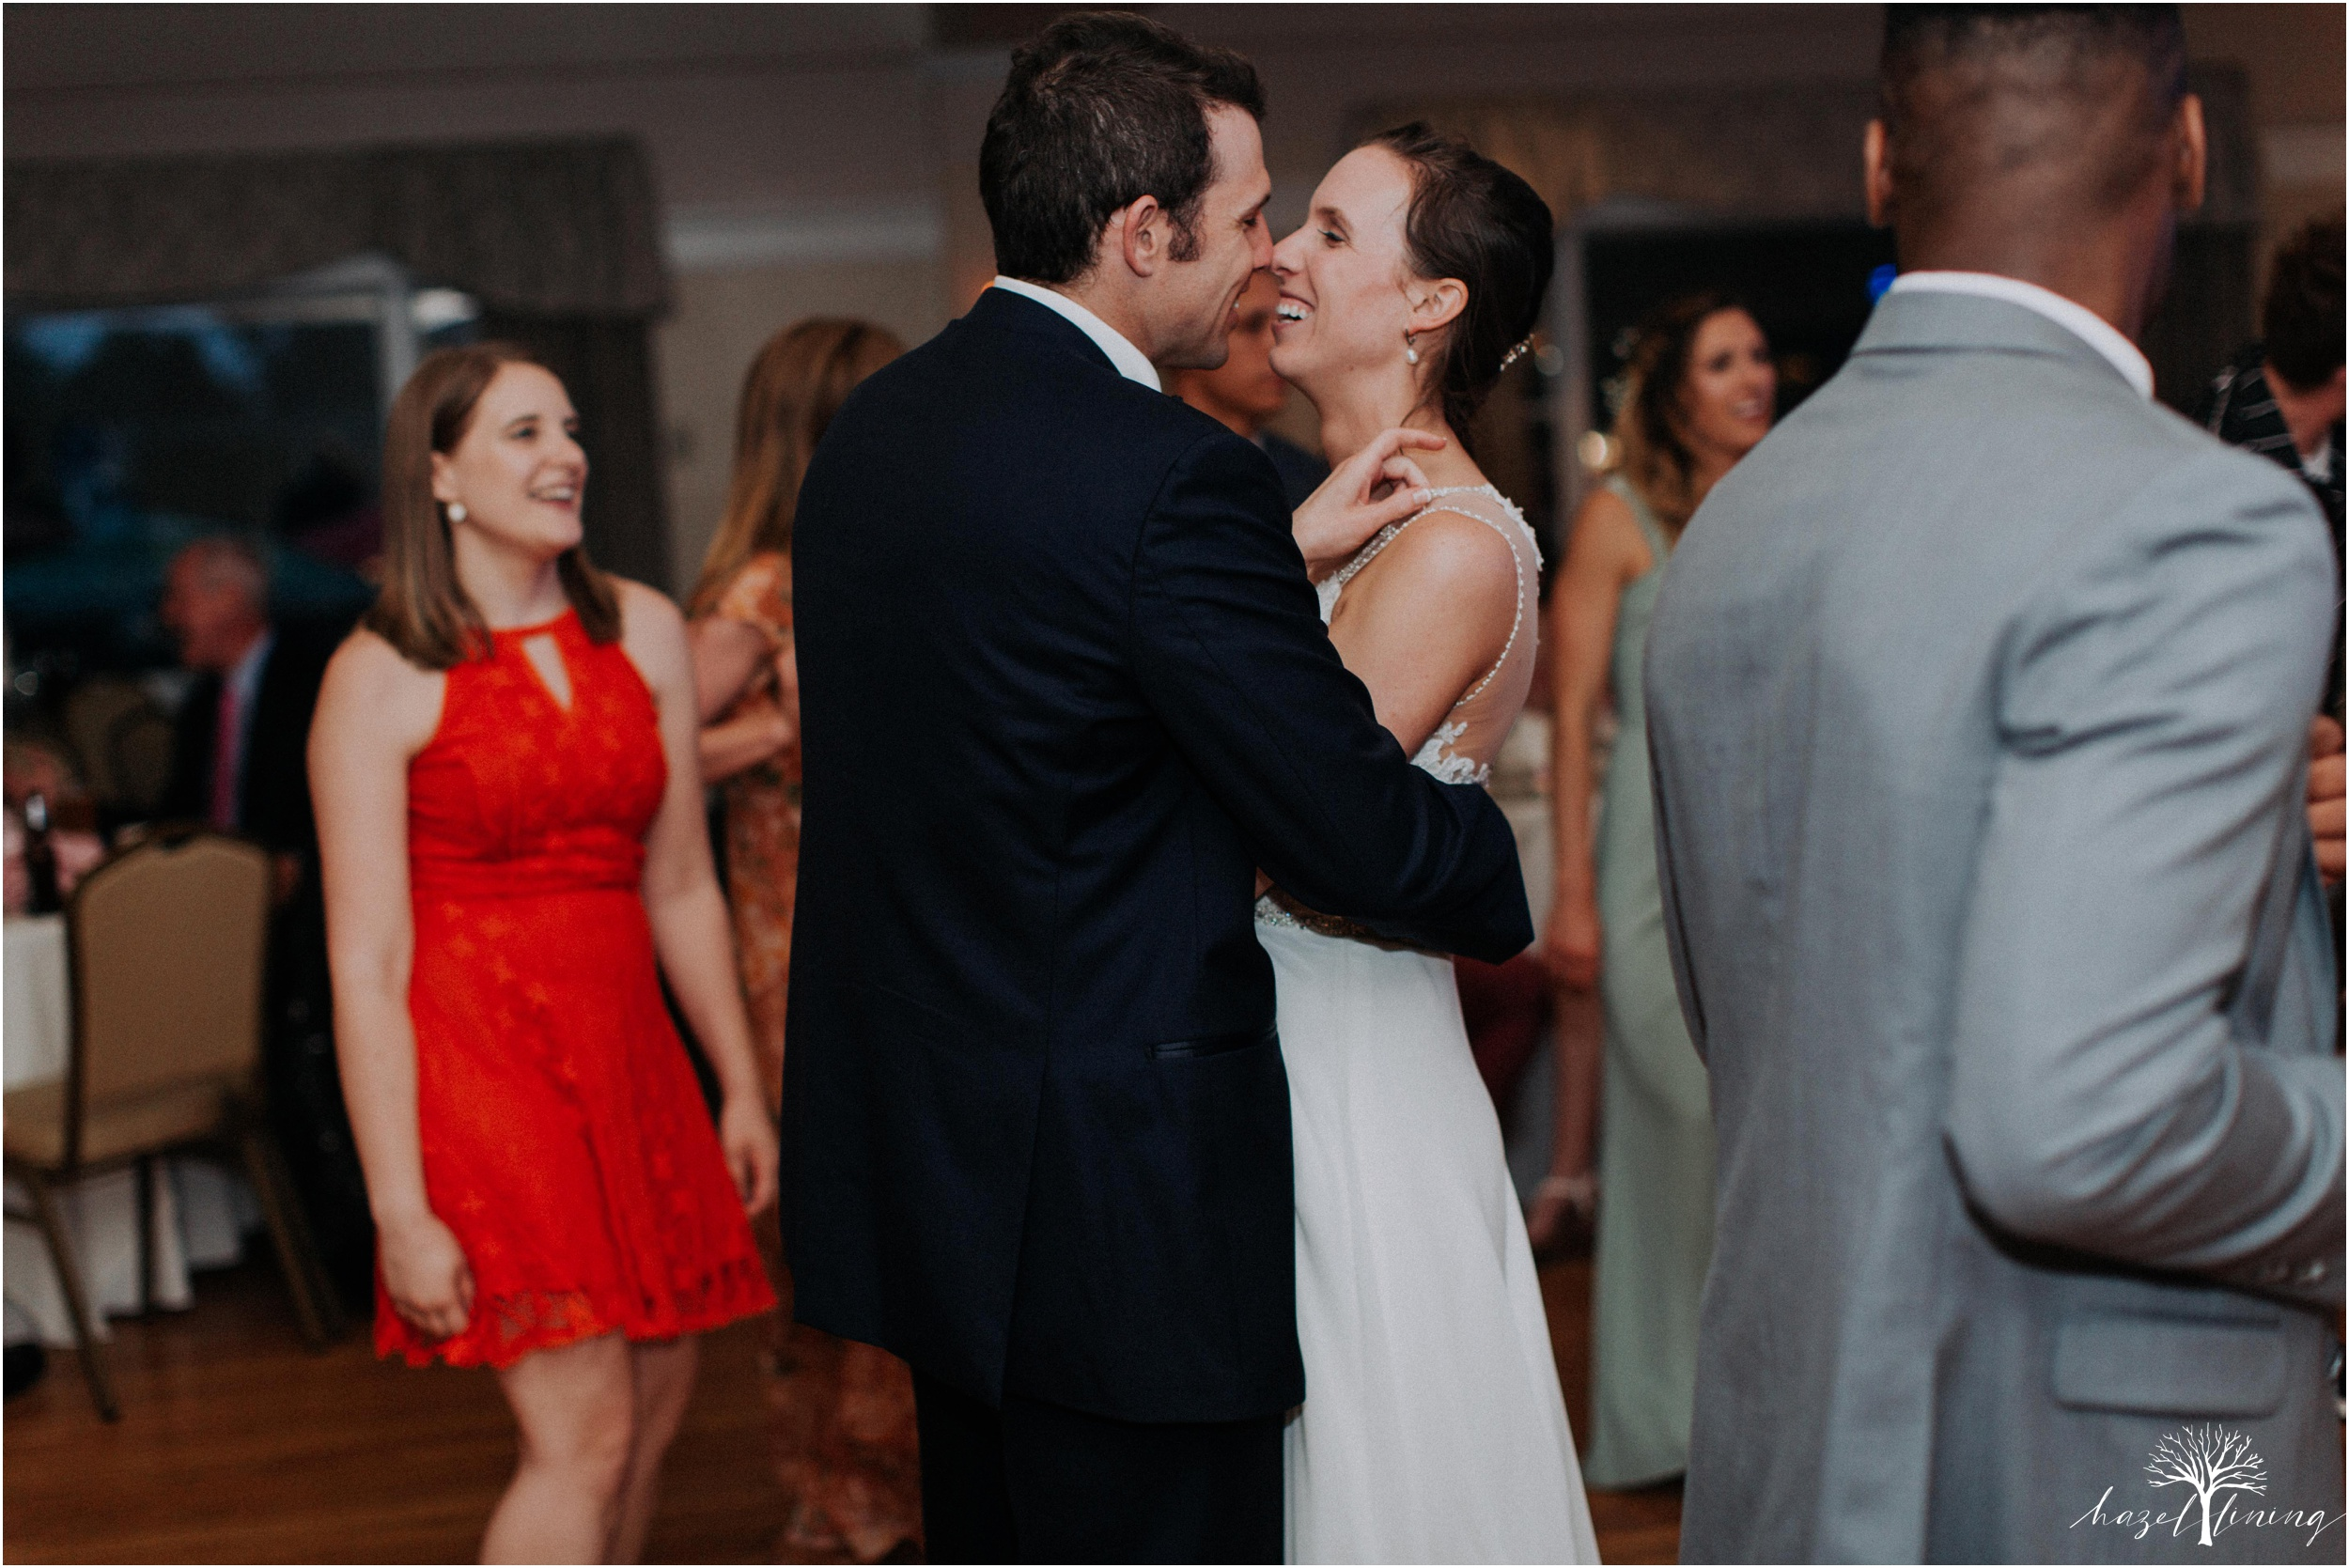 hazel-lining-travel-wedding-elopement-photography_0164.jpg